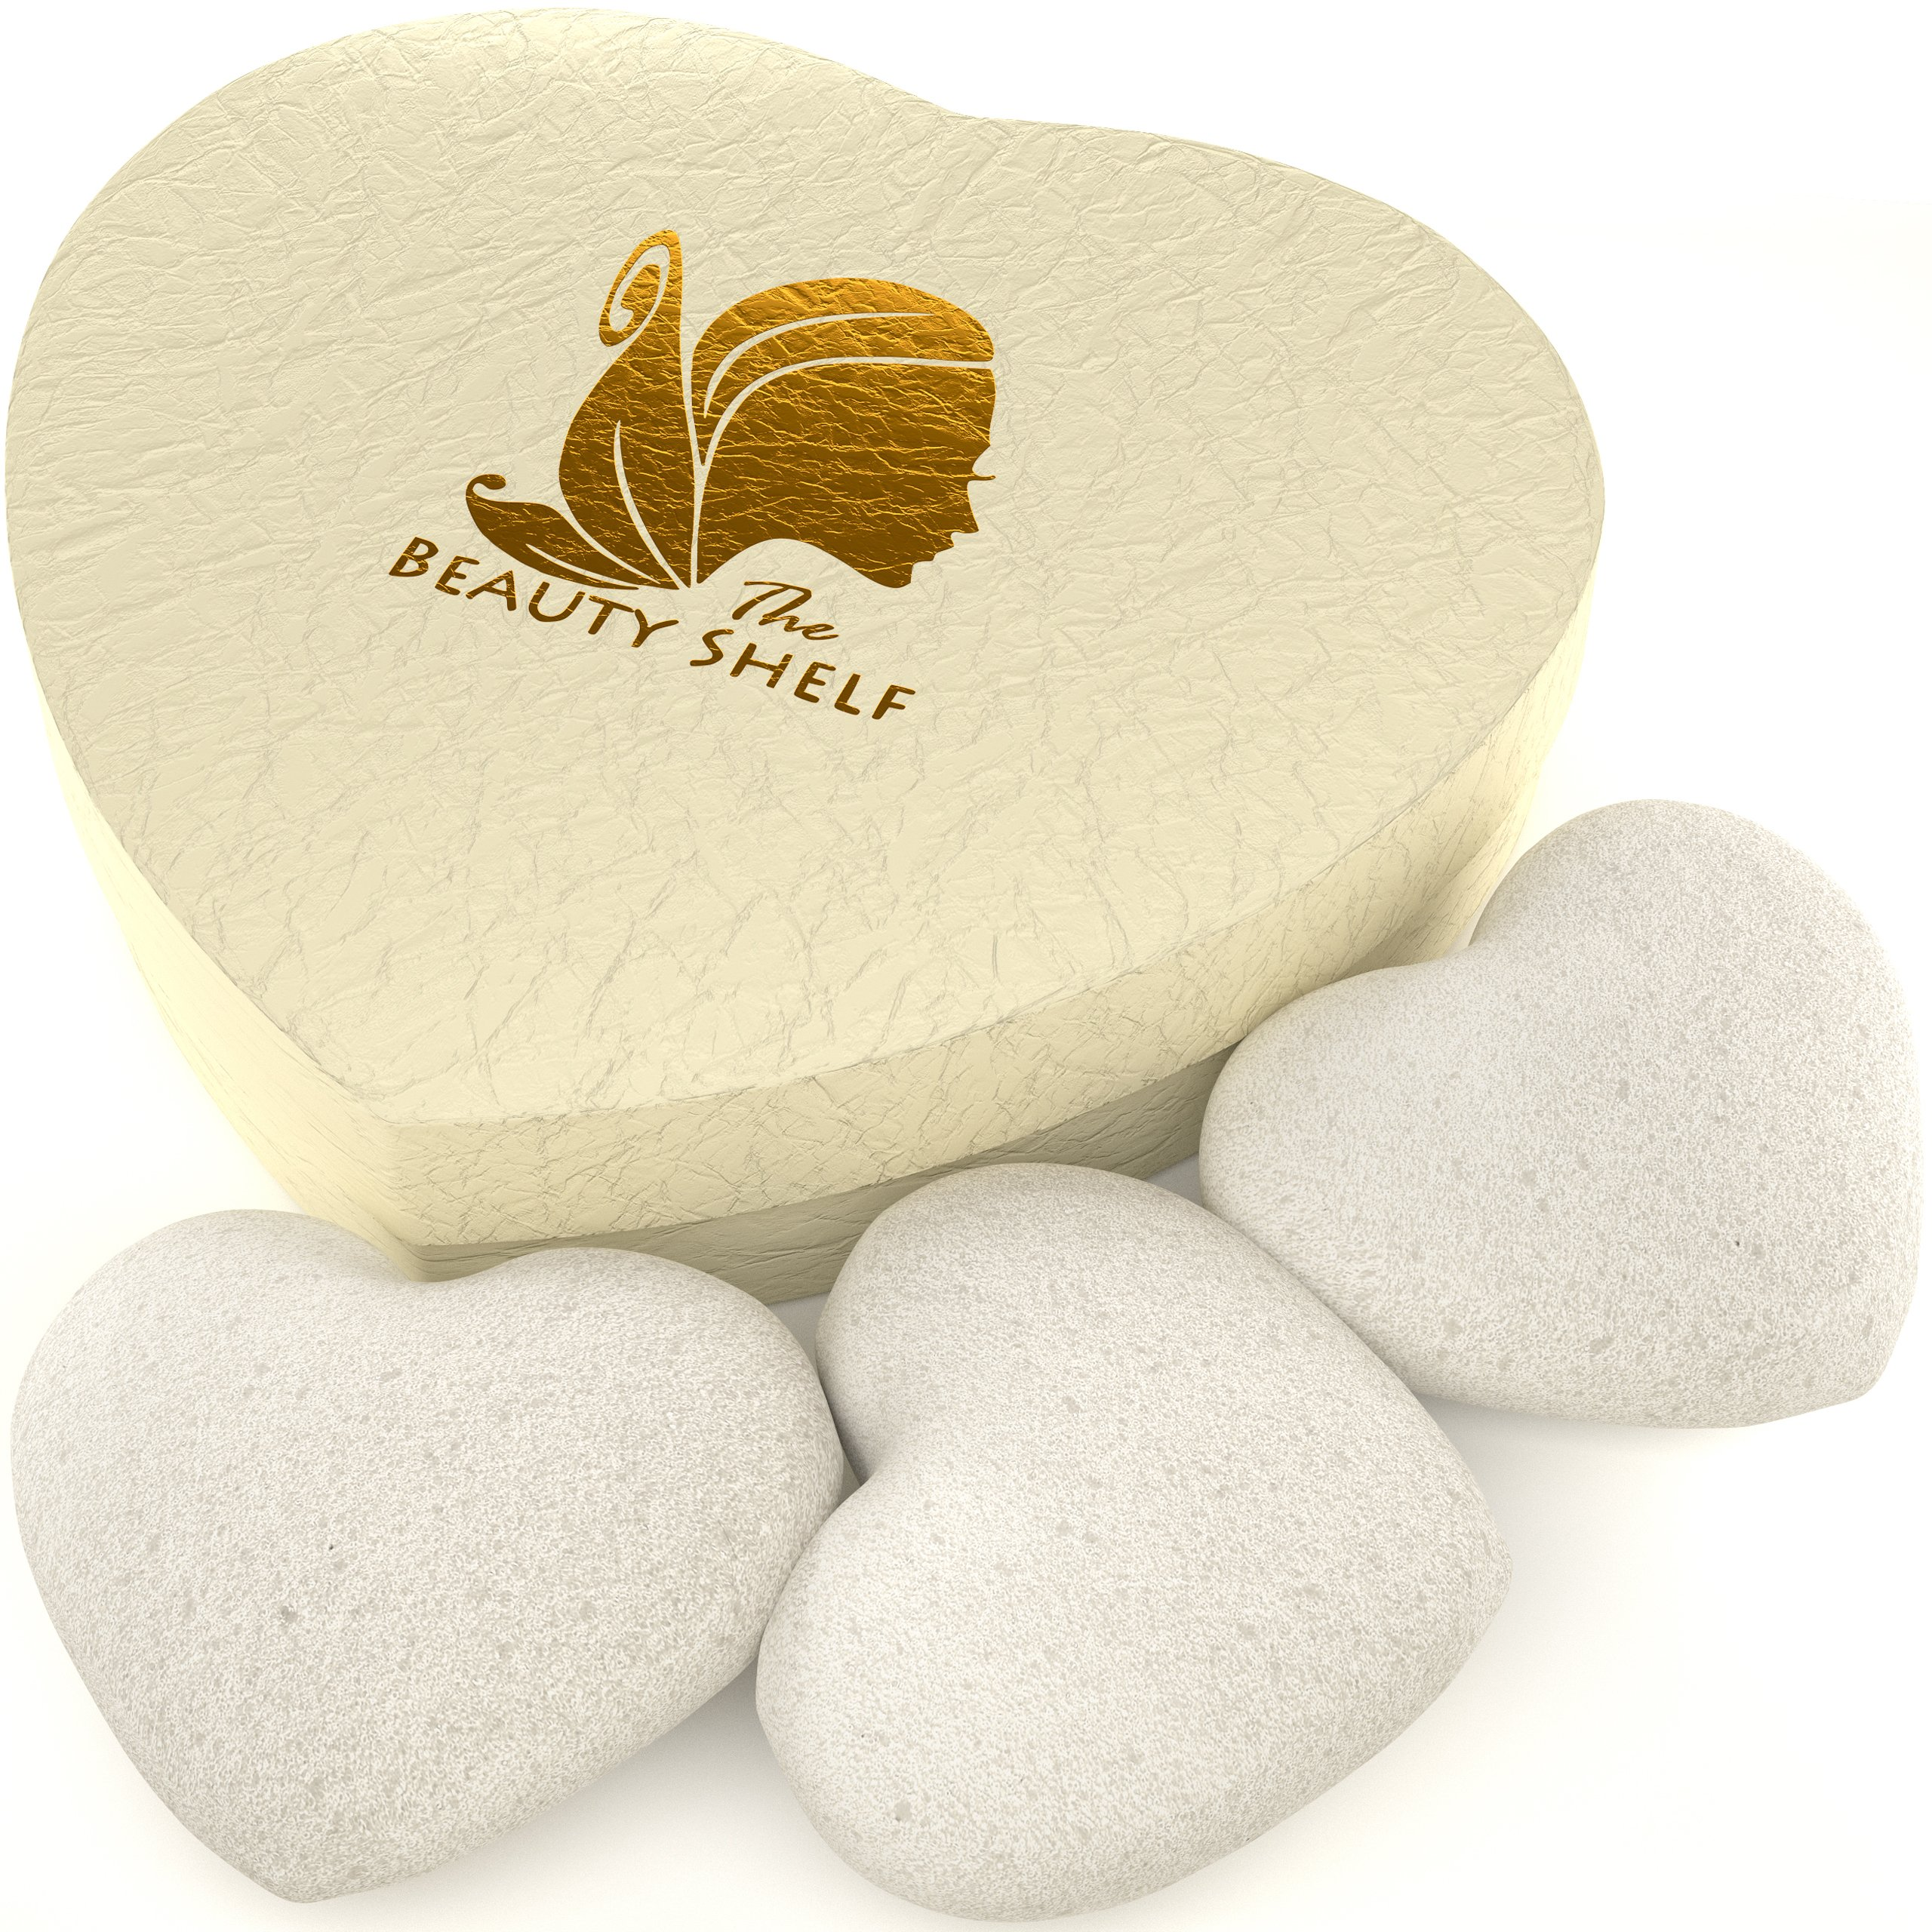 Konjac Sponge (3 Pack) - Facial Cleansing Sponges - Heart Shape for Gentle Exfoliating Beauty